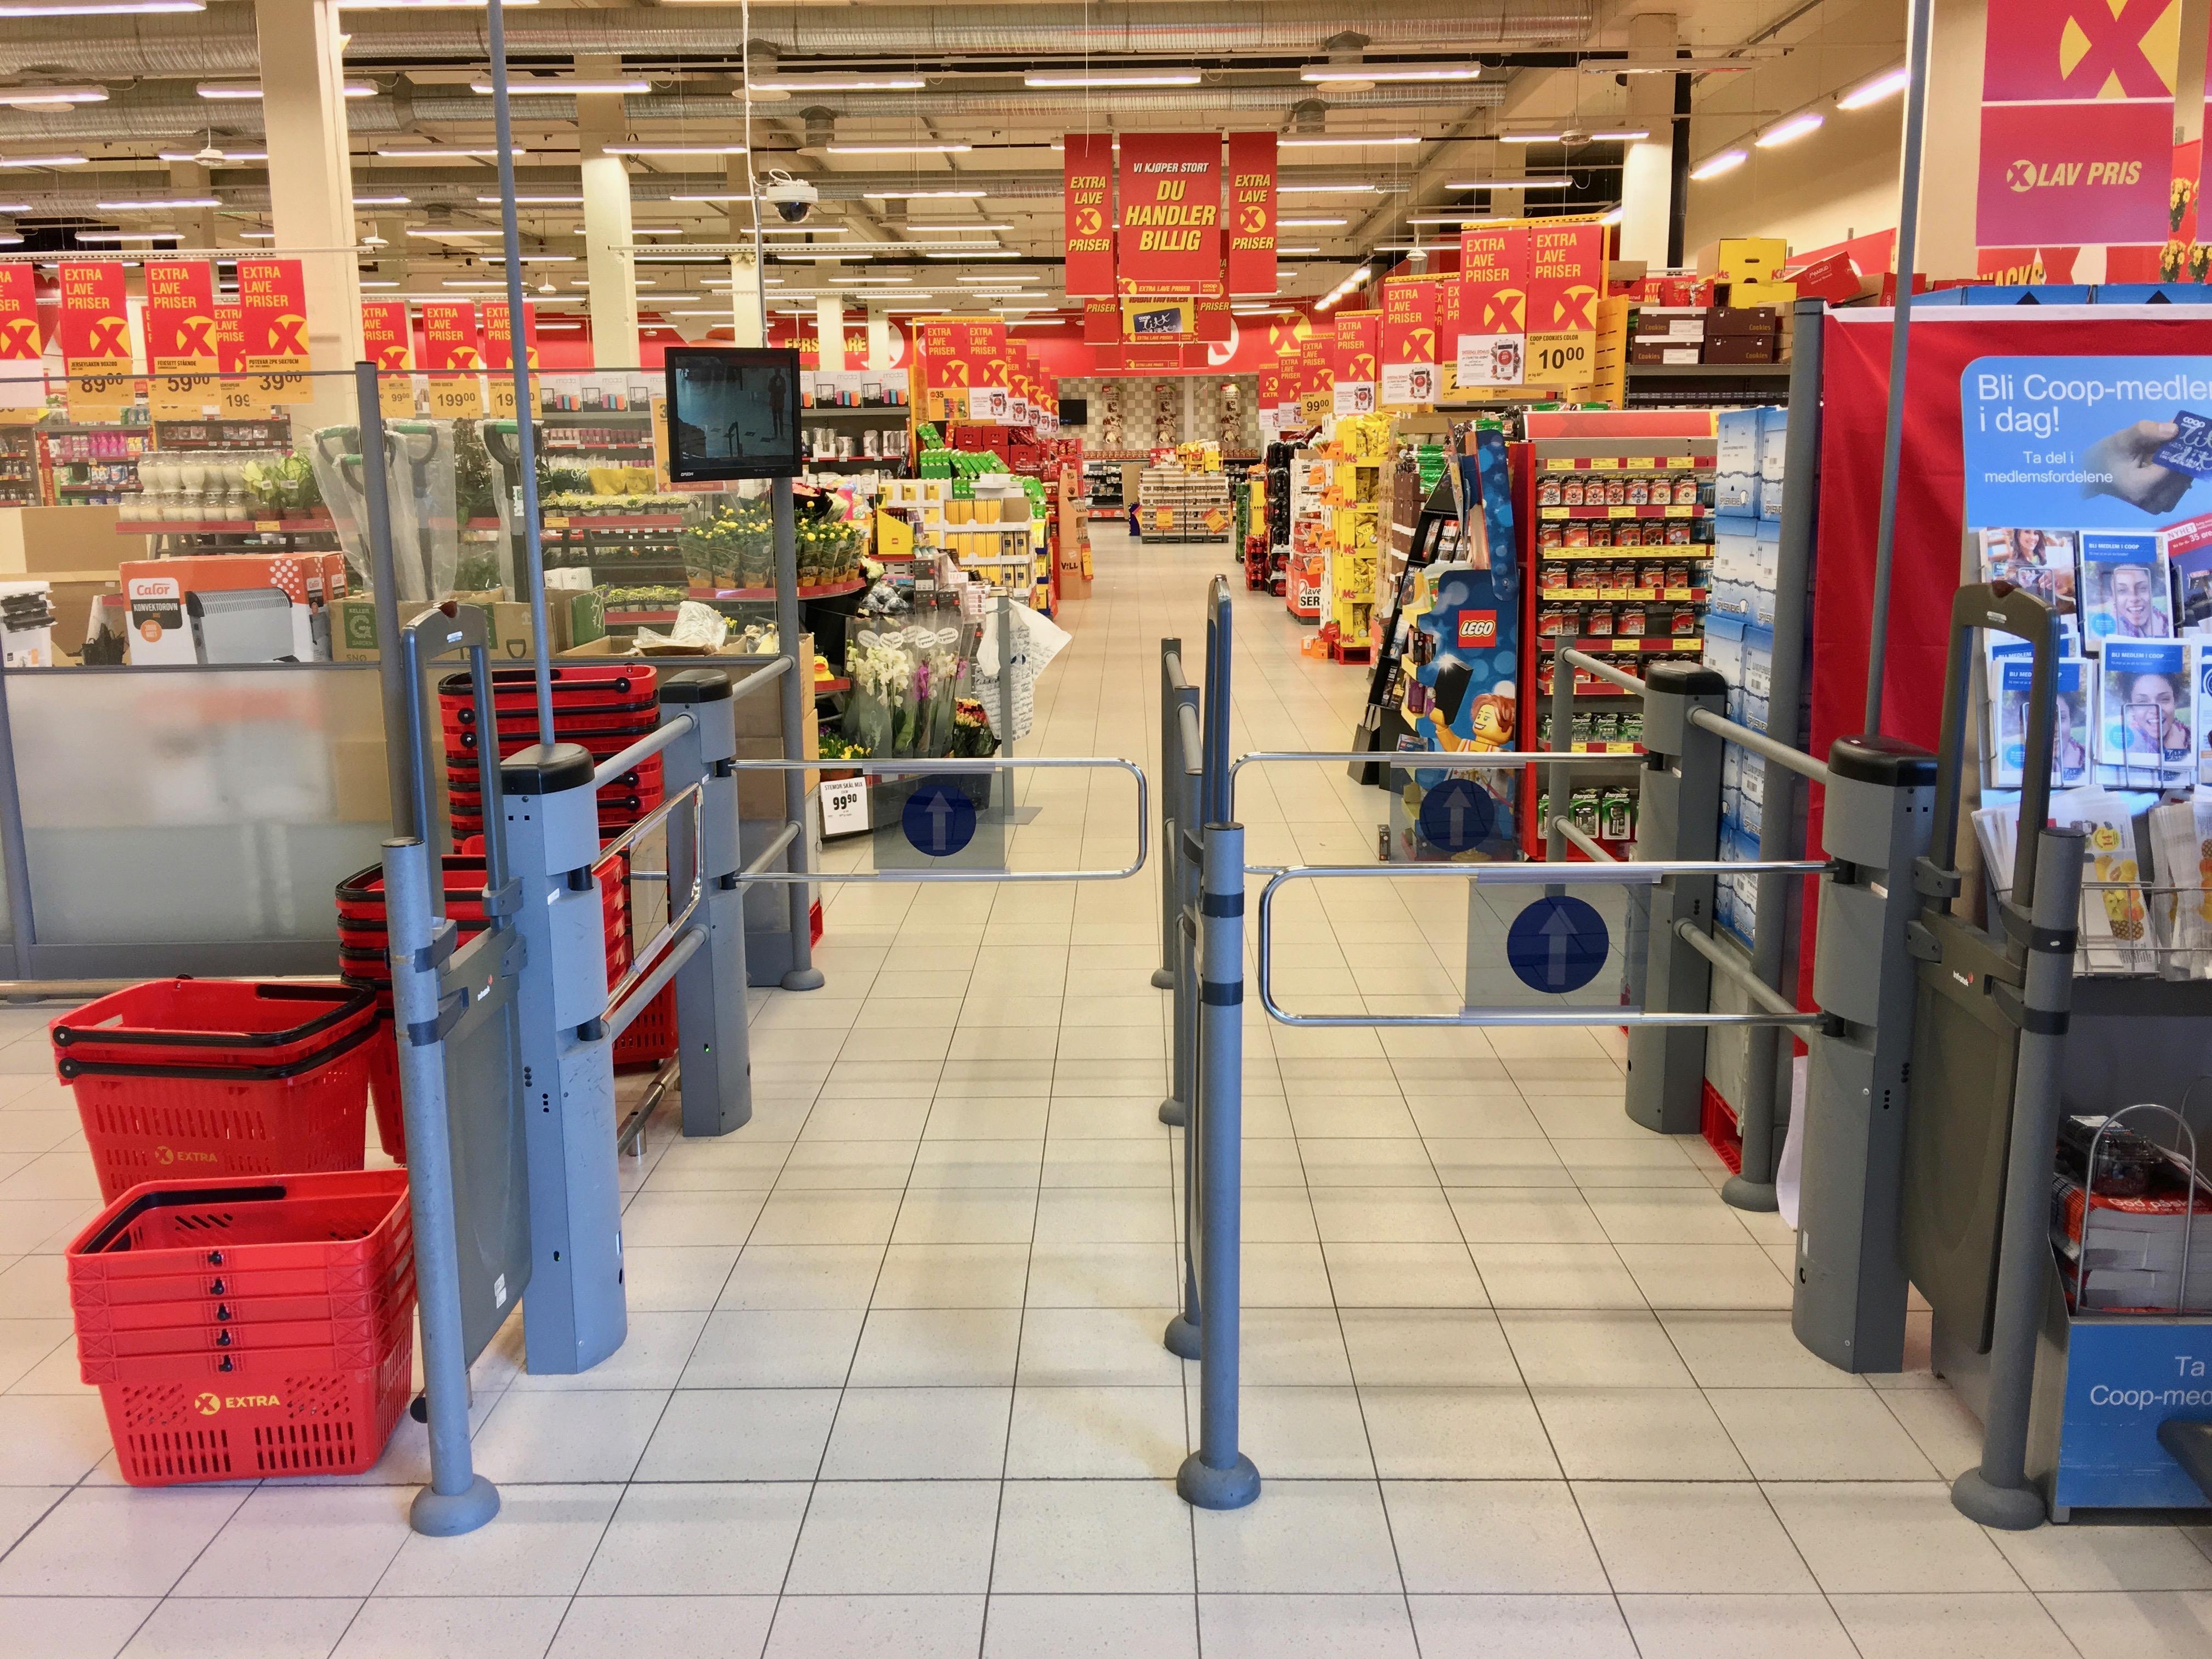 File:Extra Coop Supermarket, Amfi Shopping Mall, Osøyro